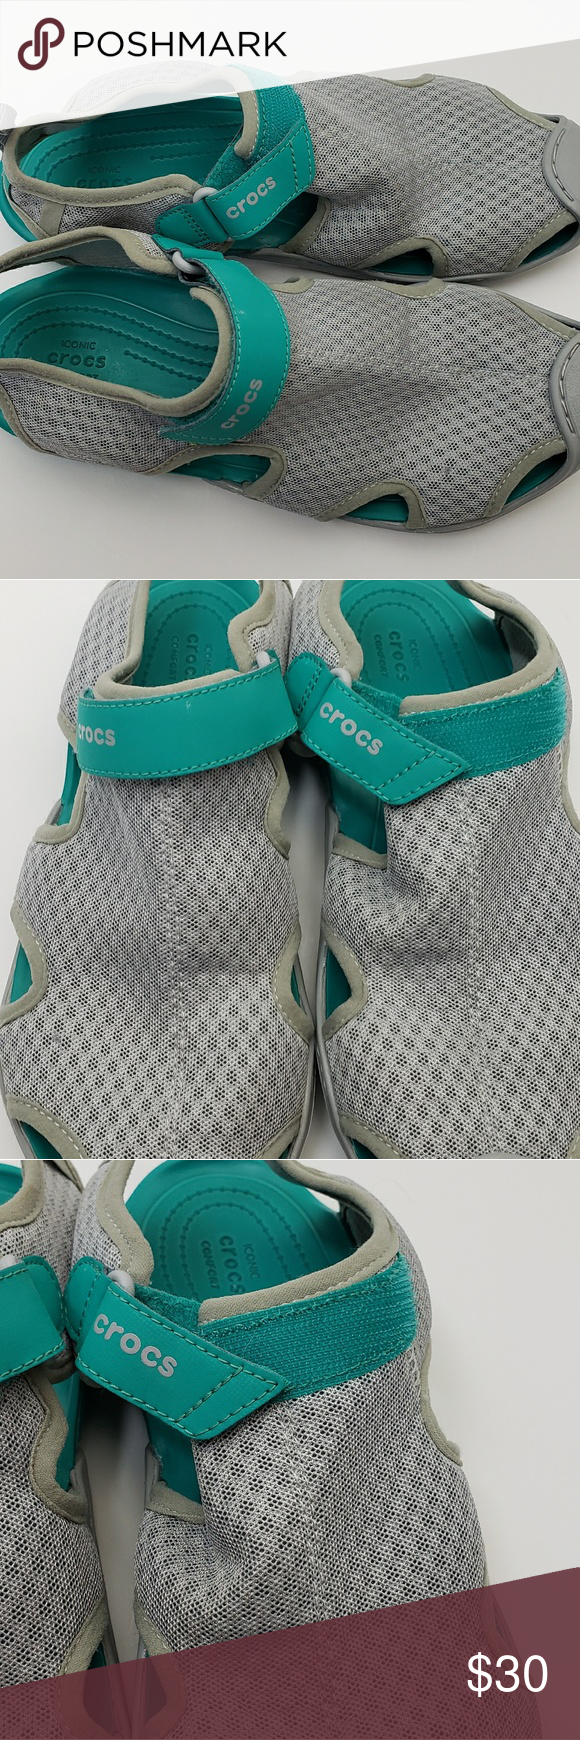 eb5f85abc85c Crocs Women s Swiftwater Mesh Sandal